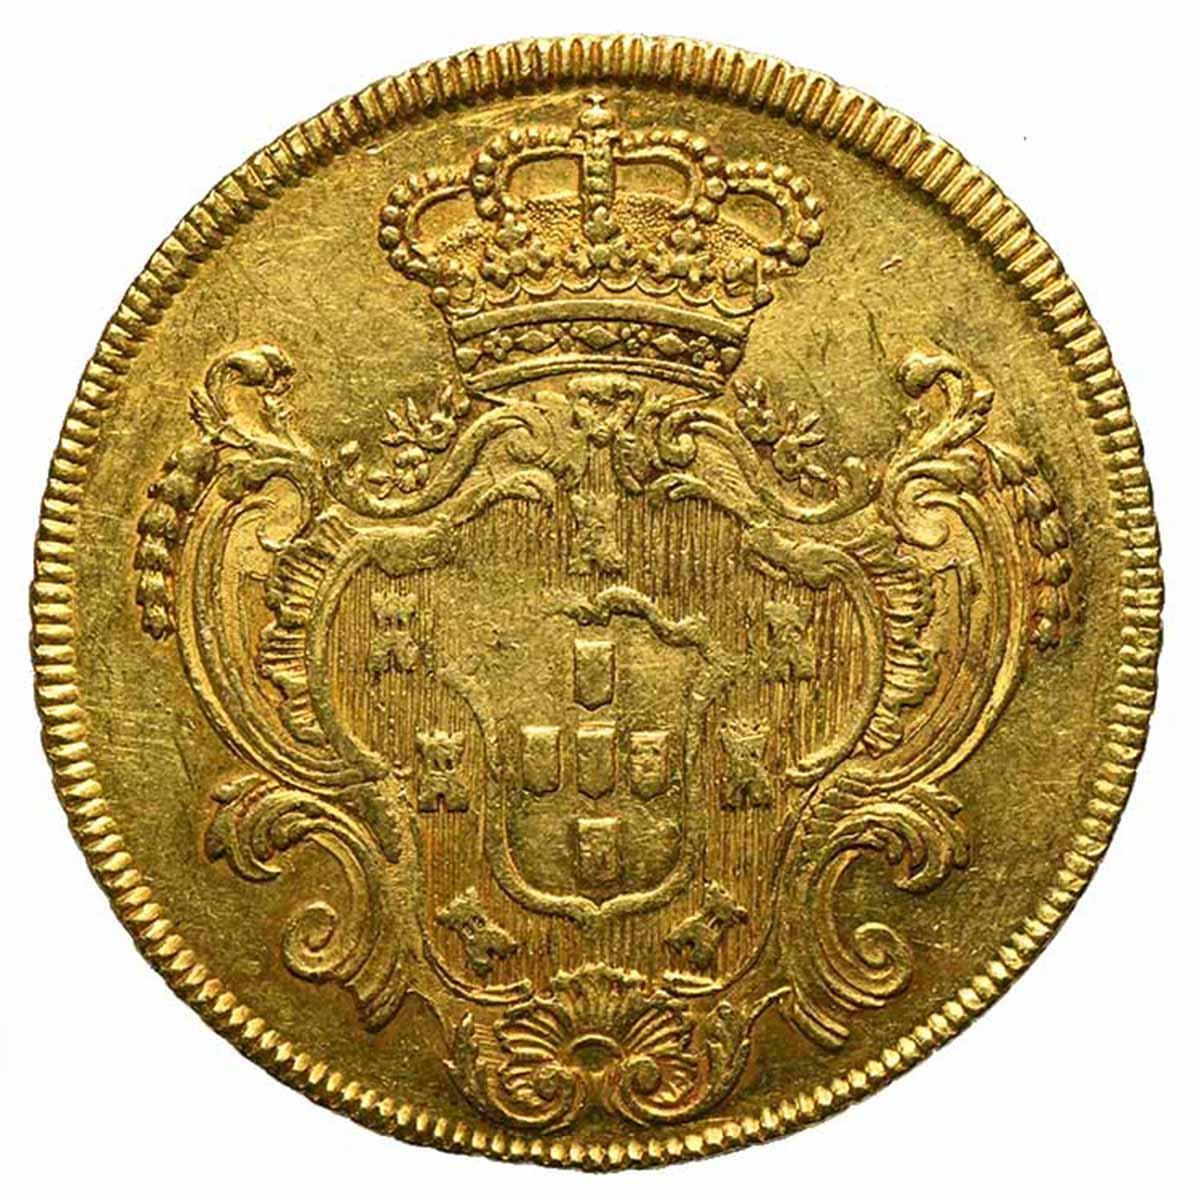 Moneta in oro del Brasile 6400 Reis o peca di Re Pedro III e Maria